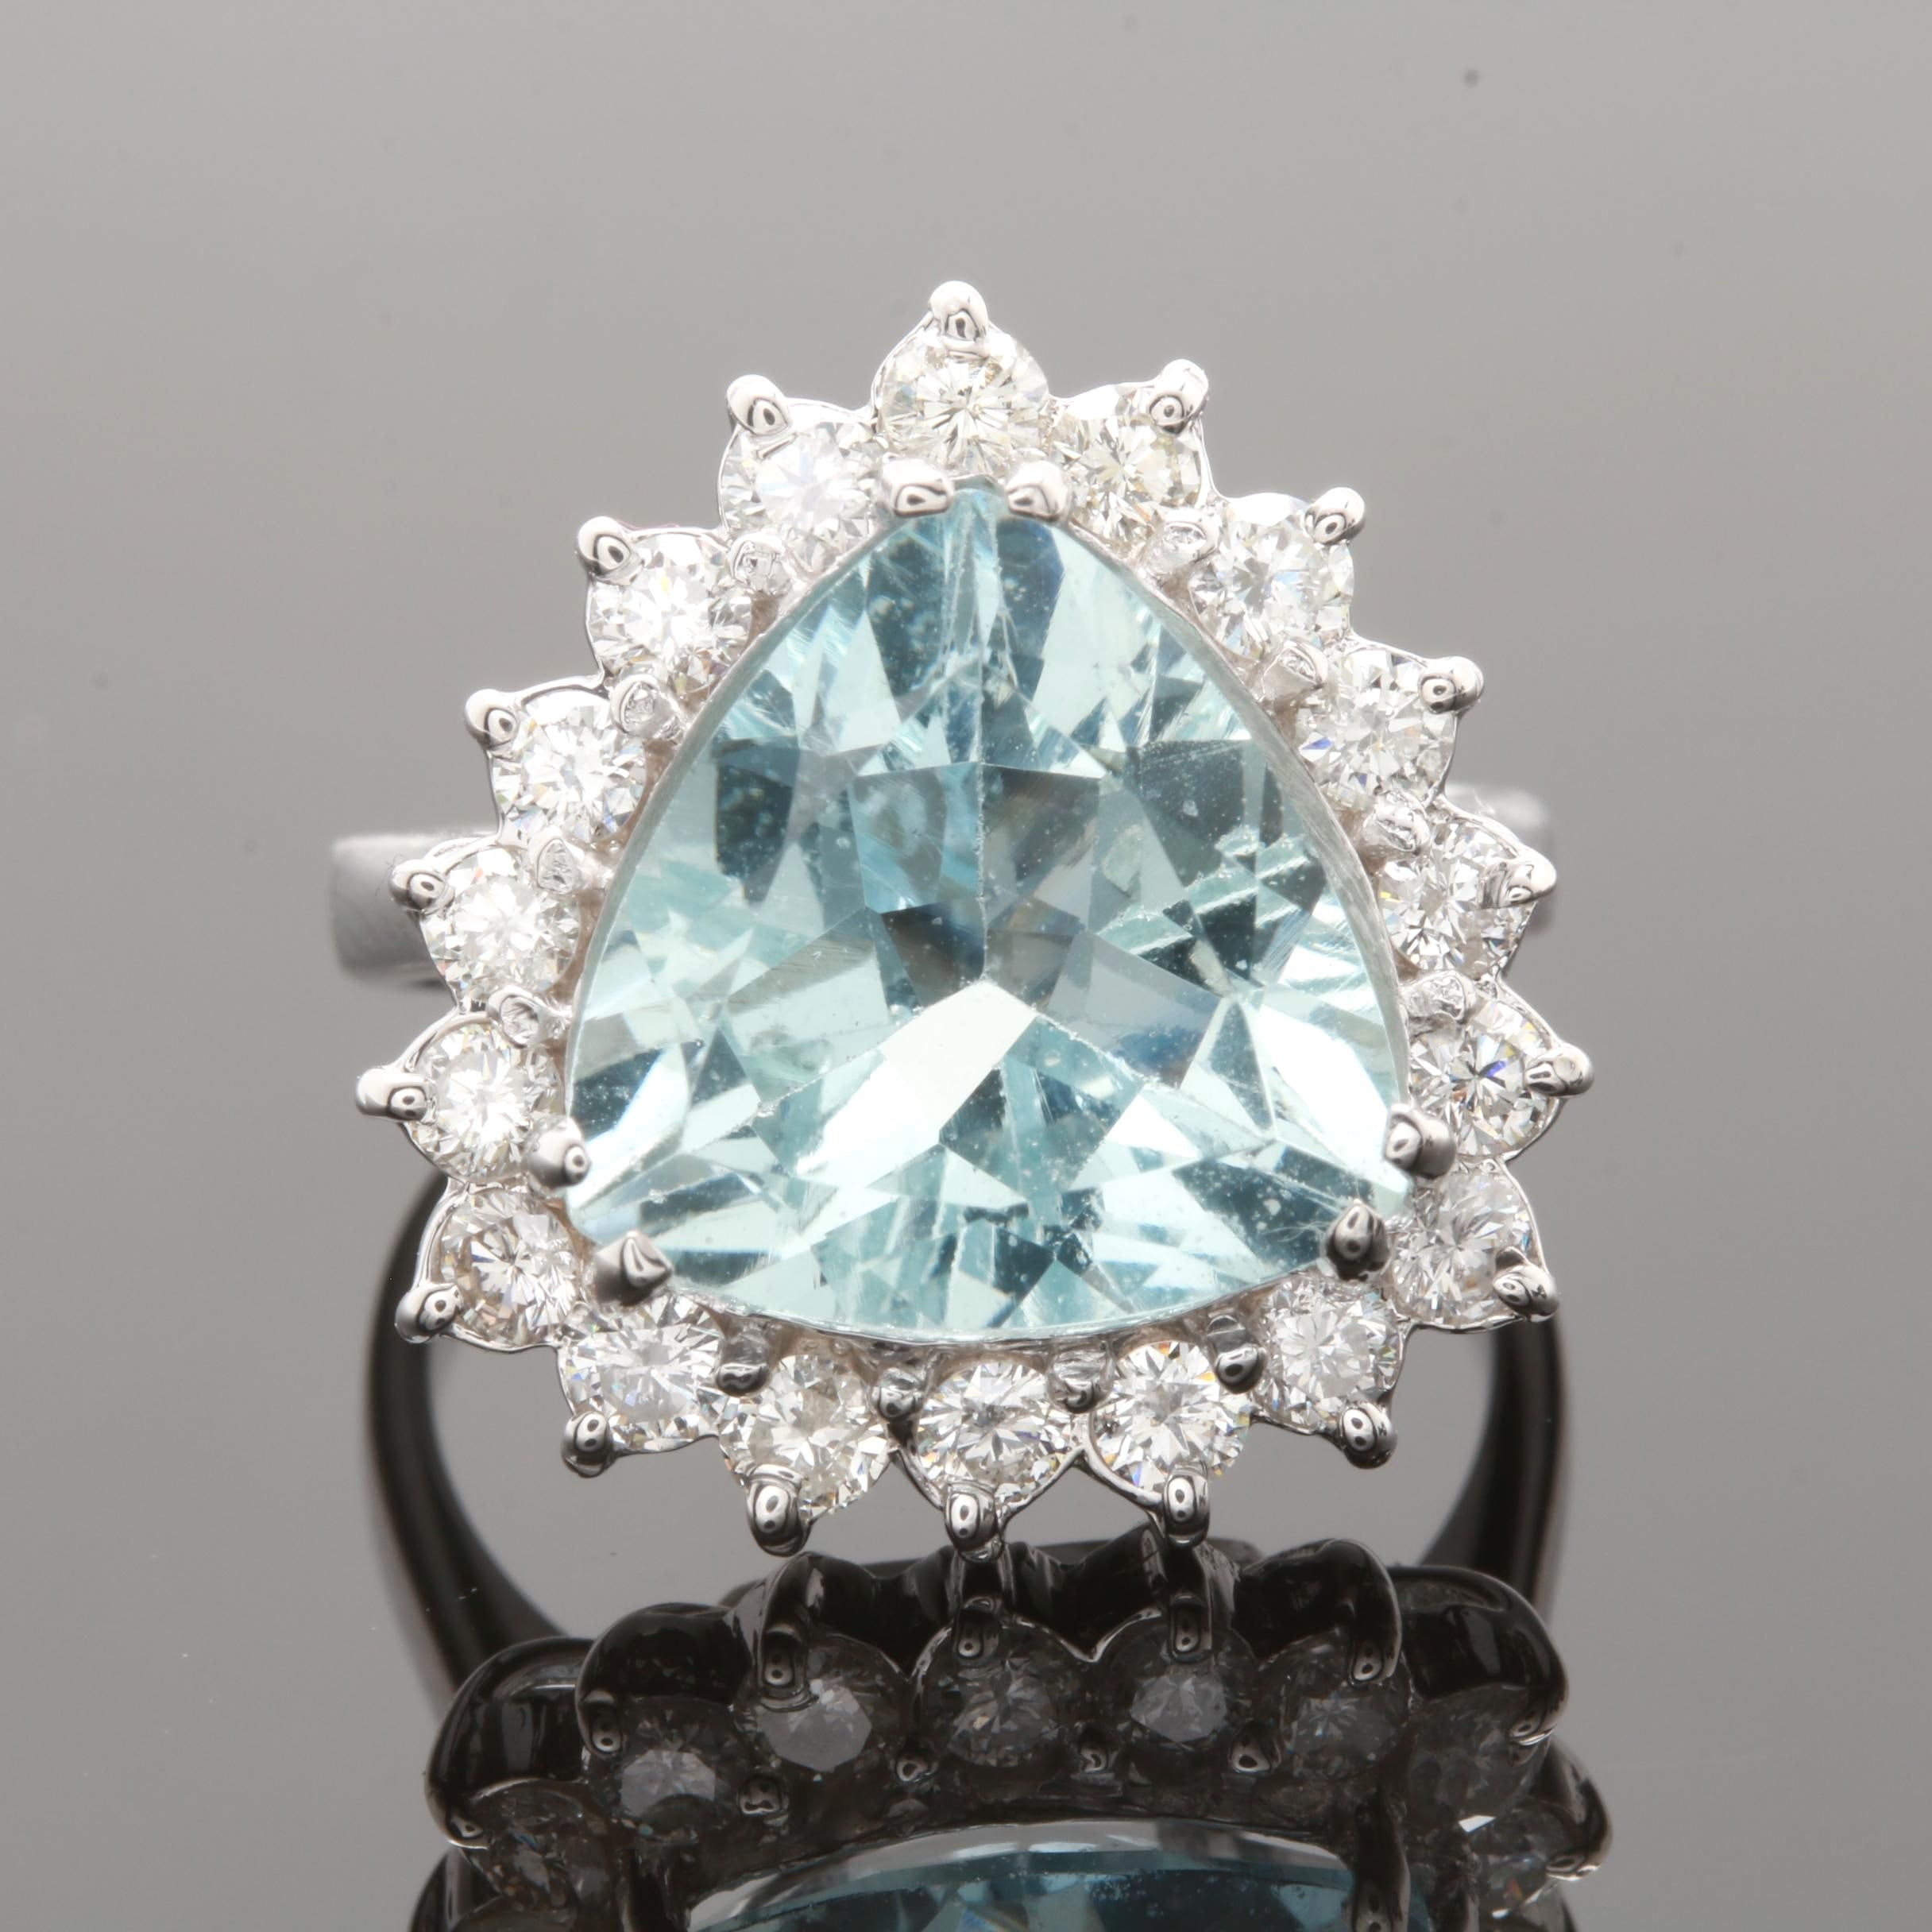 14K White Gold 3.41 CT and 0.85 CTW Diamond Ring